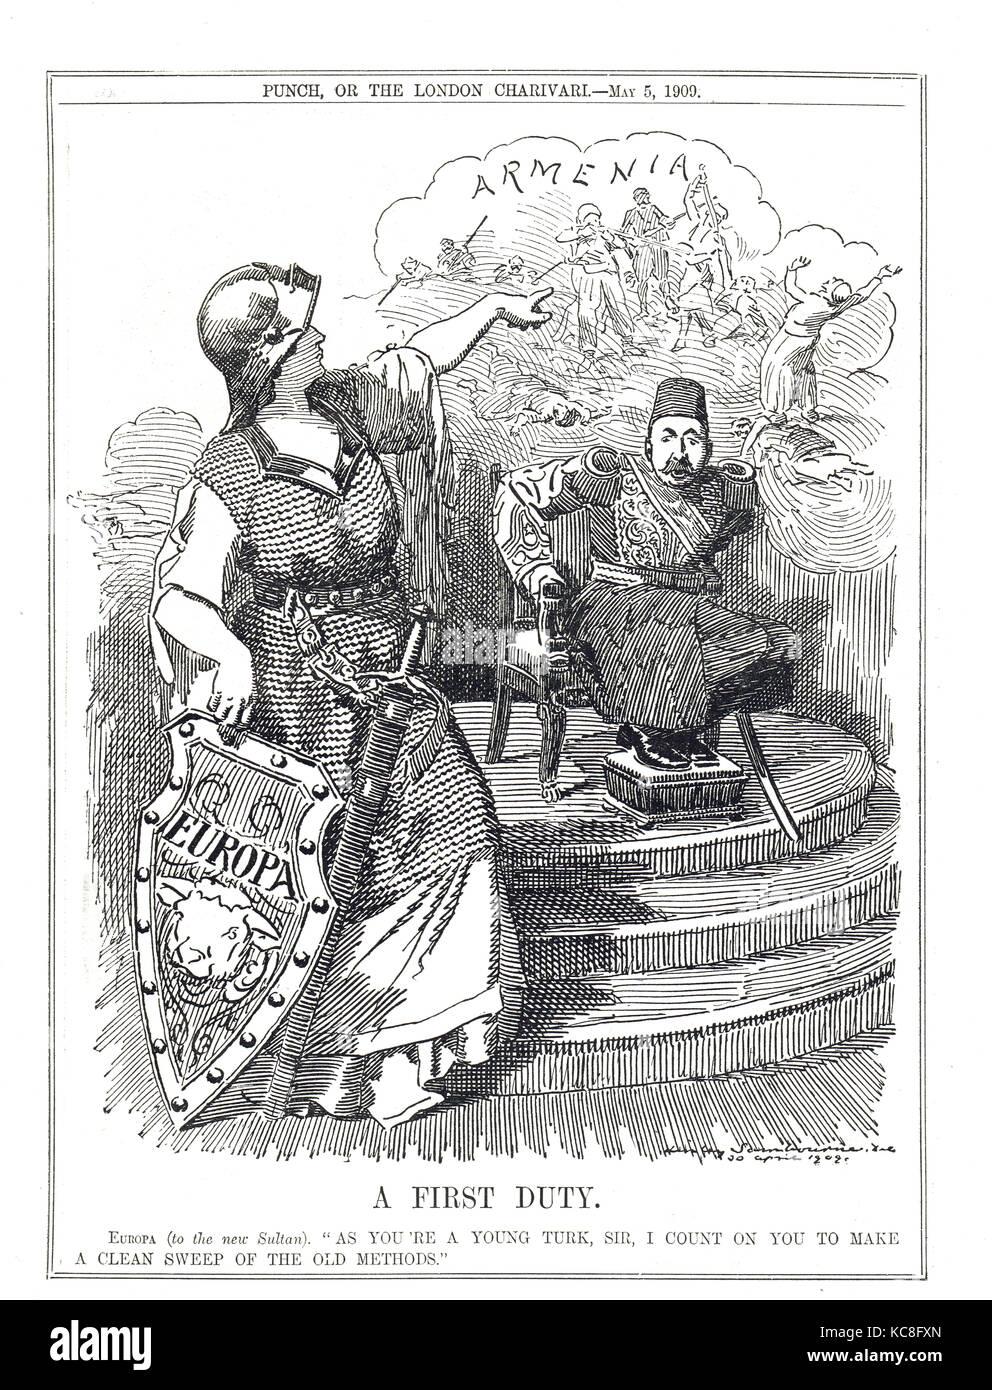 Adana massacre in Armenia, Punch cartoon,1909 - Stock Image